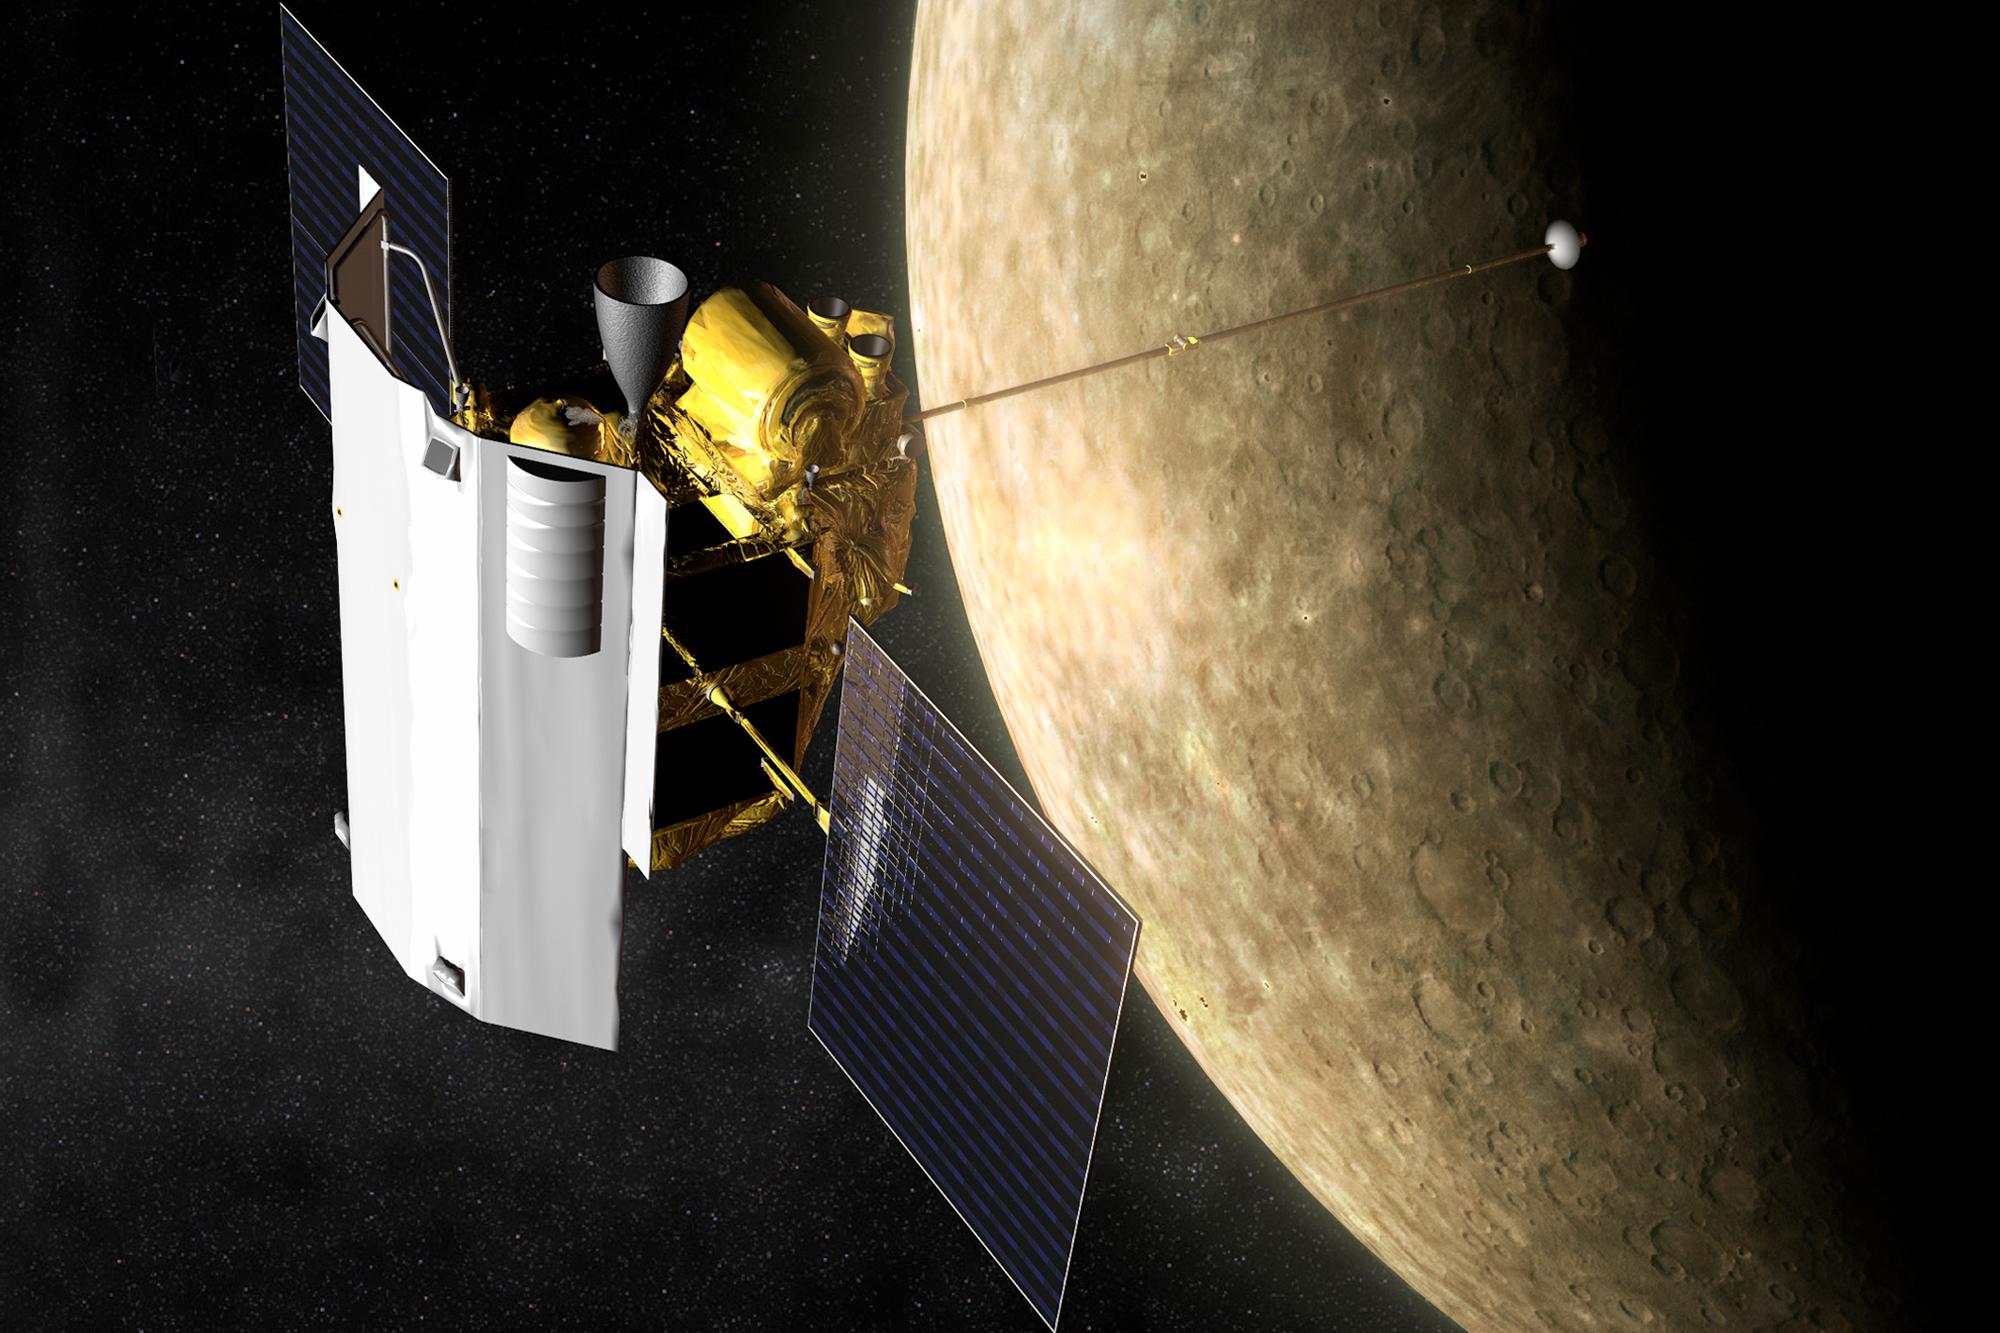 messenger spacecraft discoveries - HD2000×1333